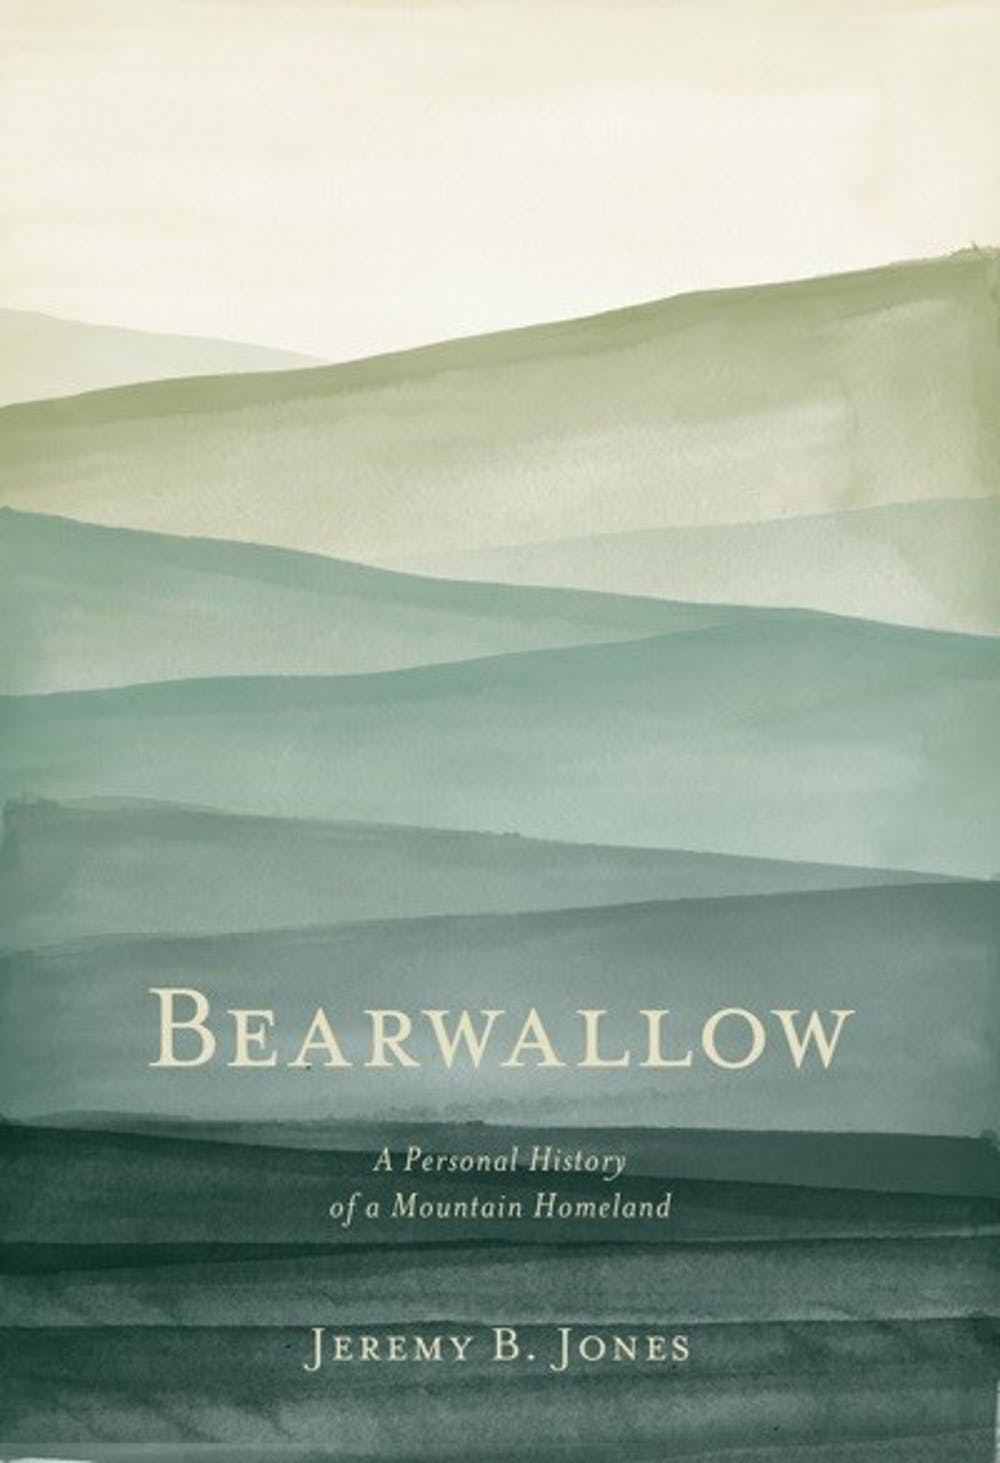 bearwallow